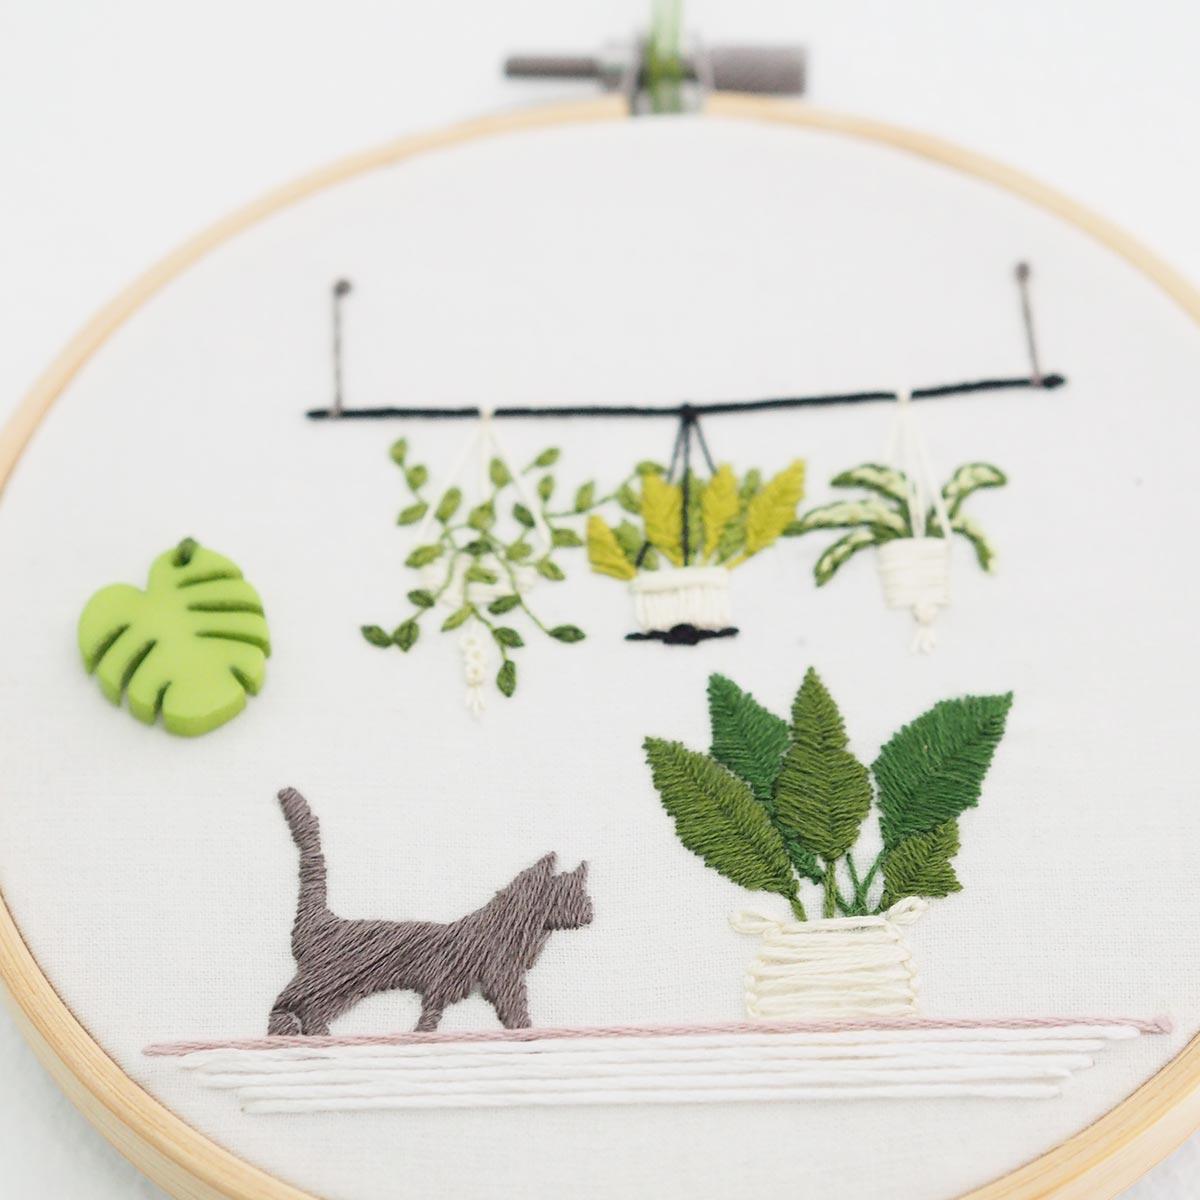 broderie-suspension-plantes-monstera-bouzielafee-green-chat